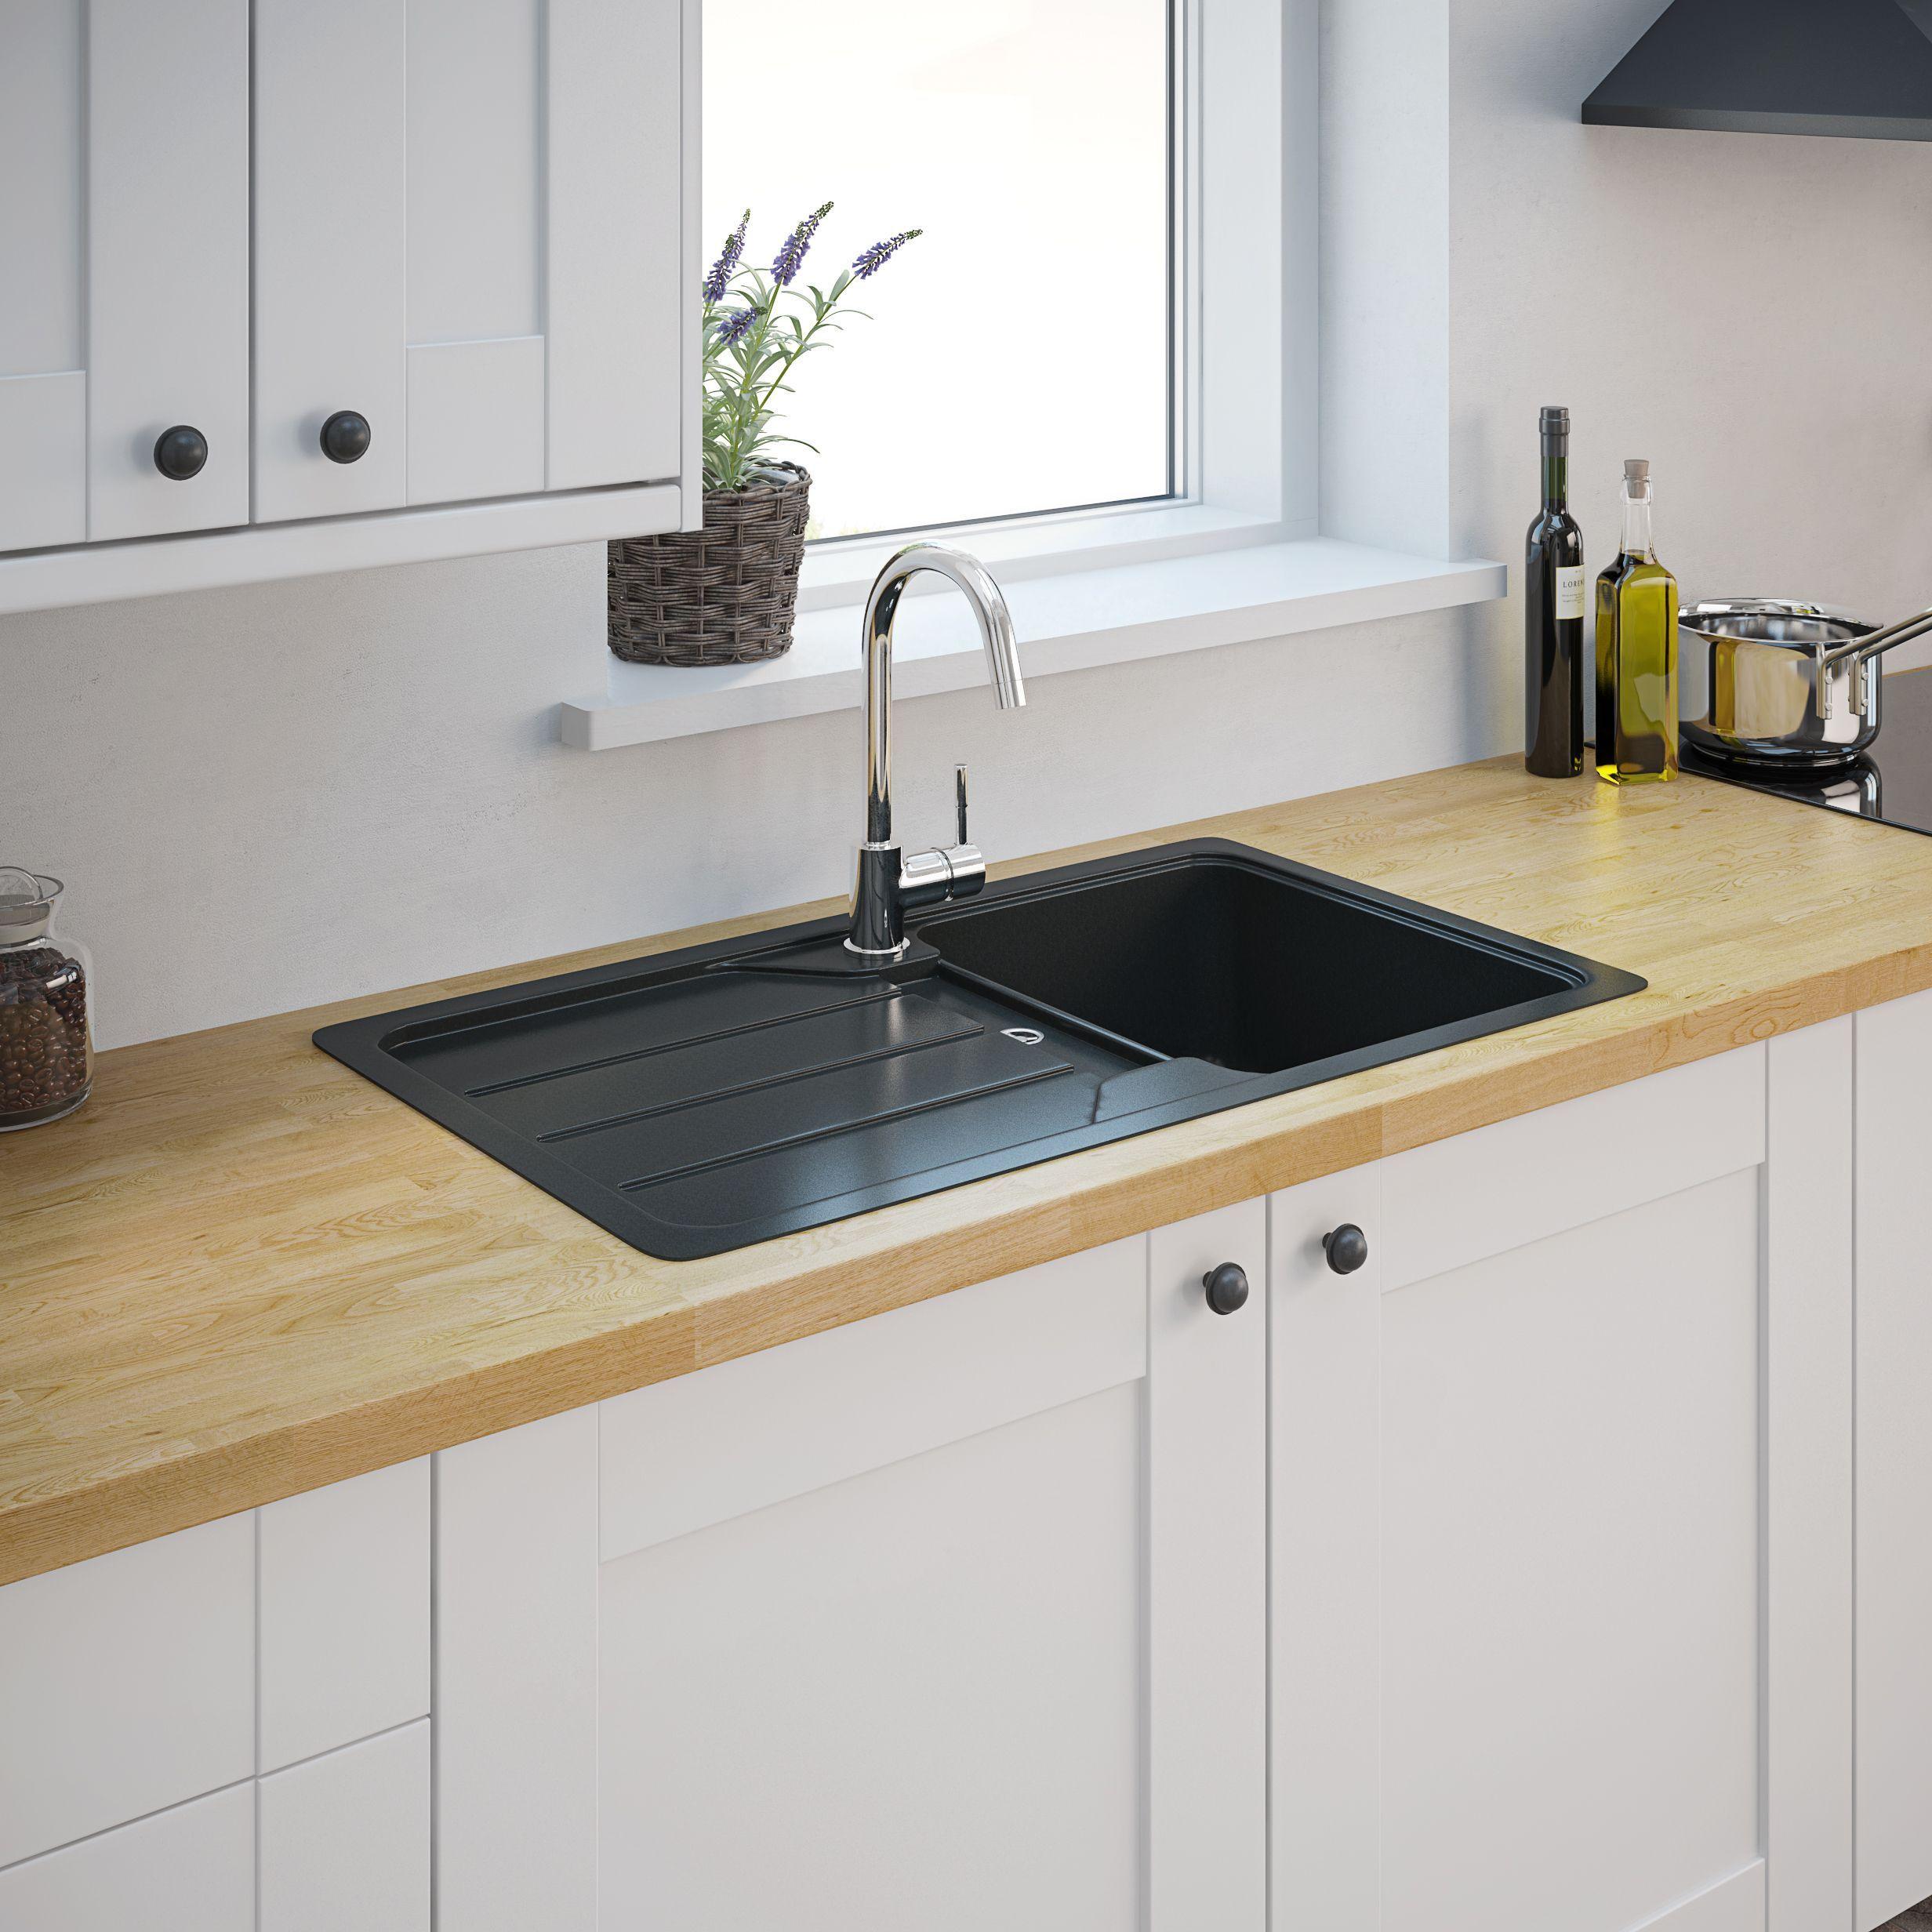 Cooke Lewis Arber Black Composite Quartz 1 Bowl Sink Drainer In 2020 Bowl Sink Composite Kitchen Sinks Sink Drainer